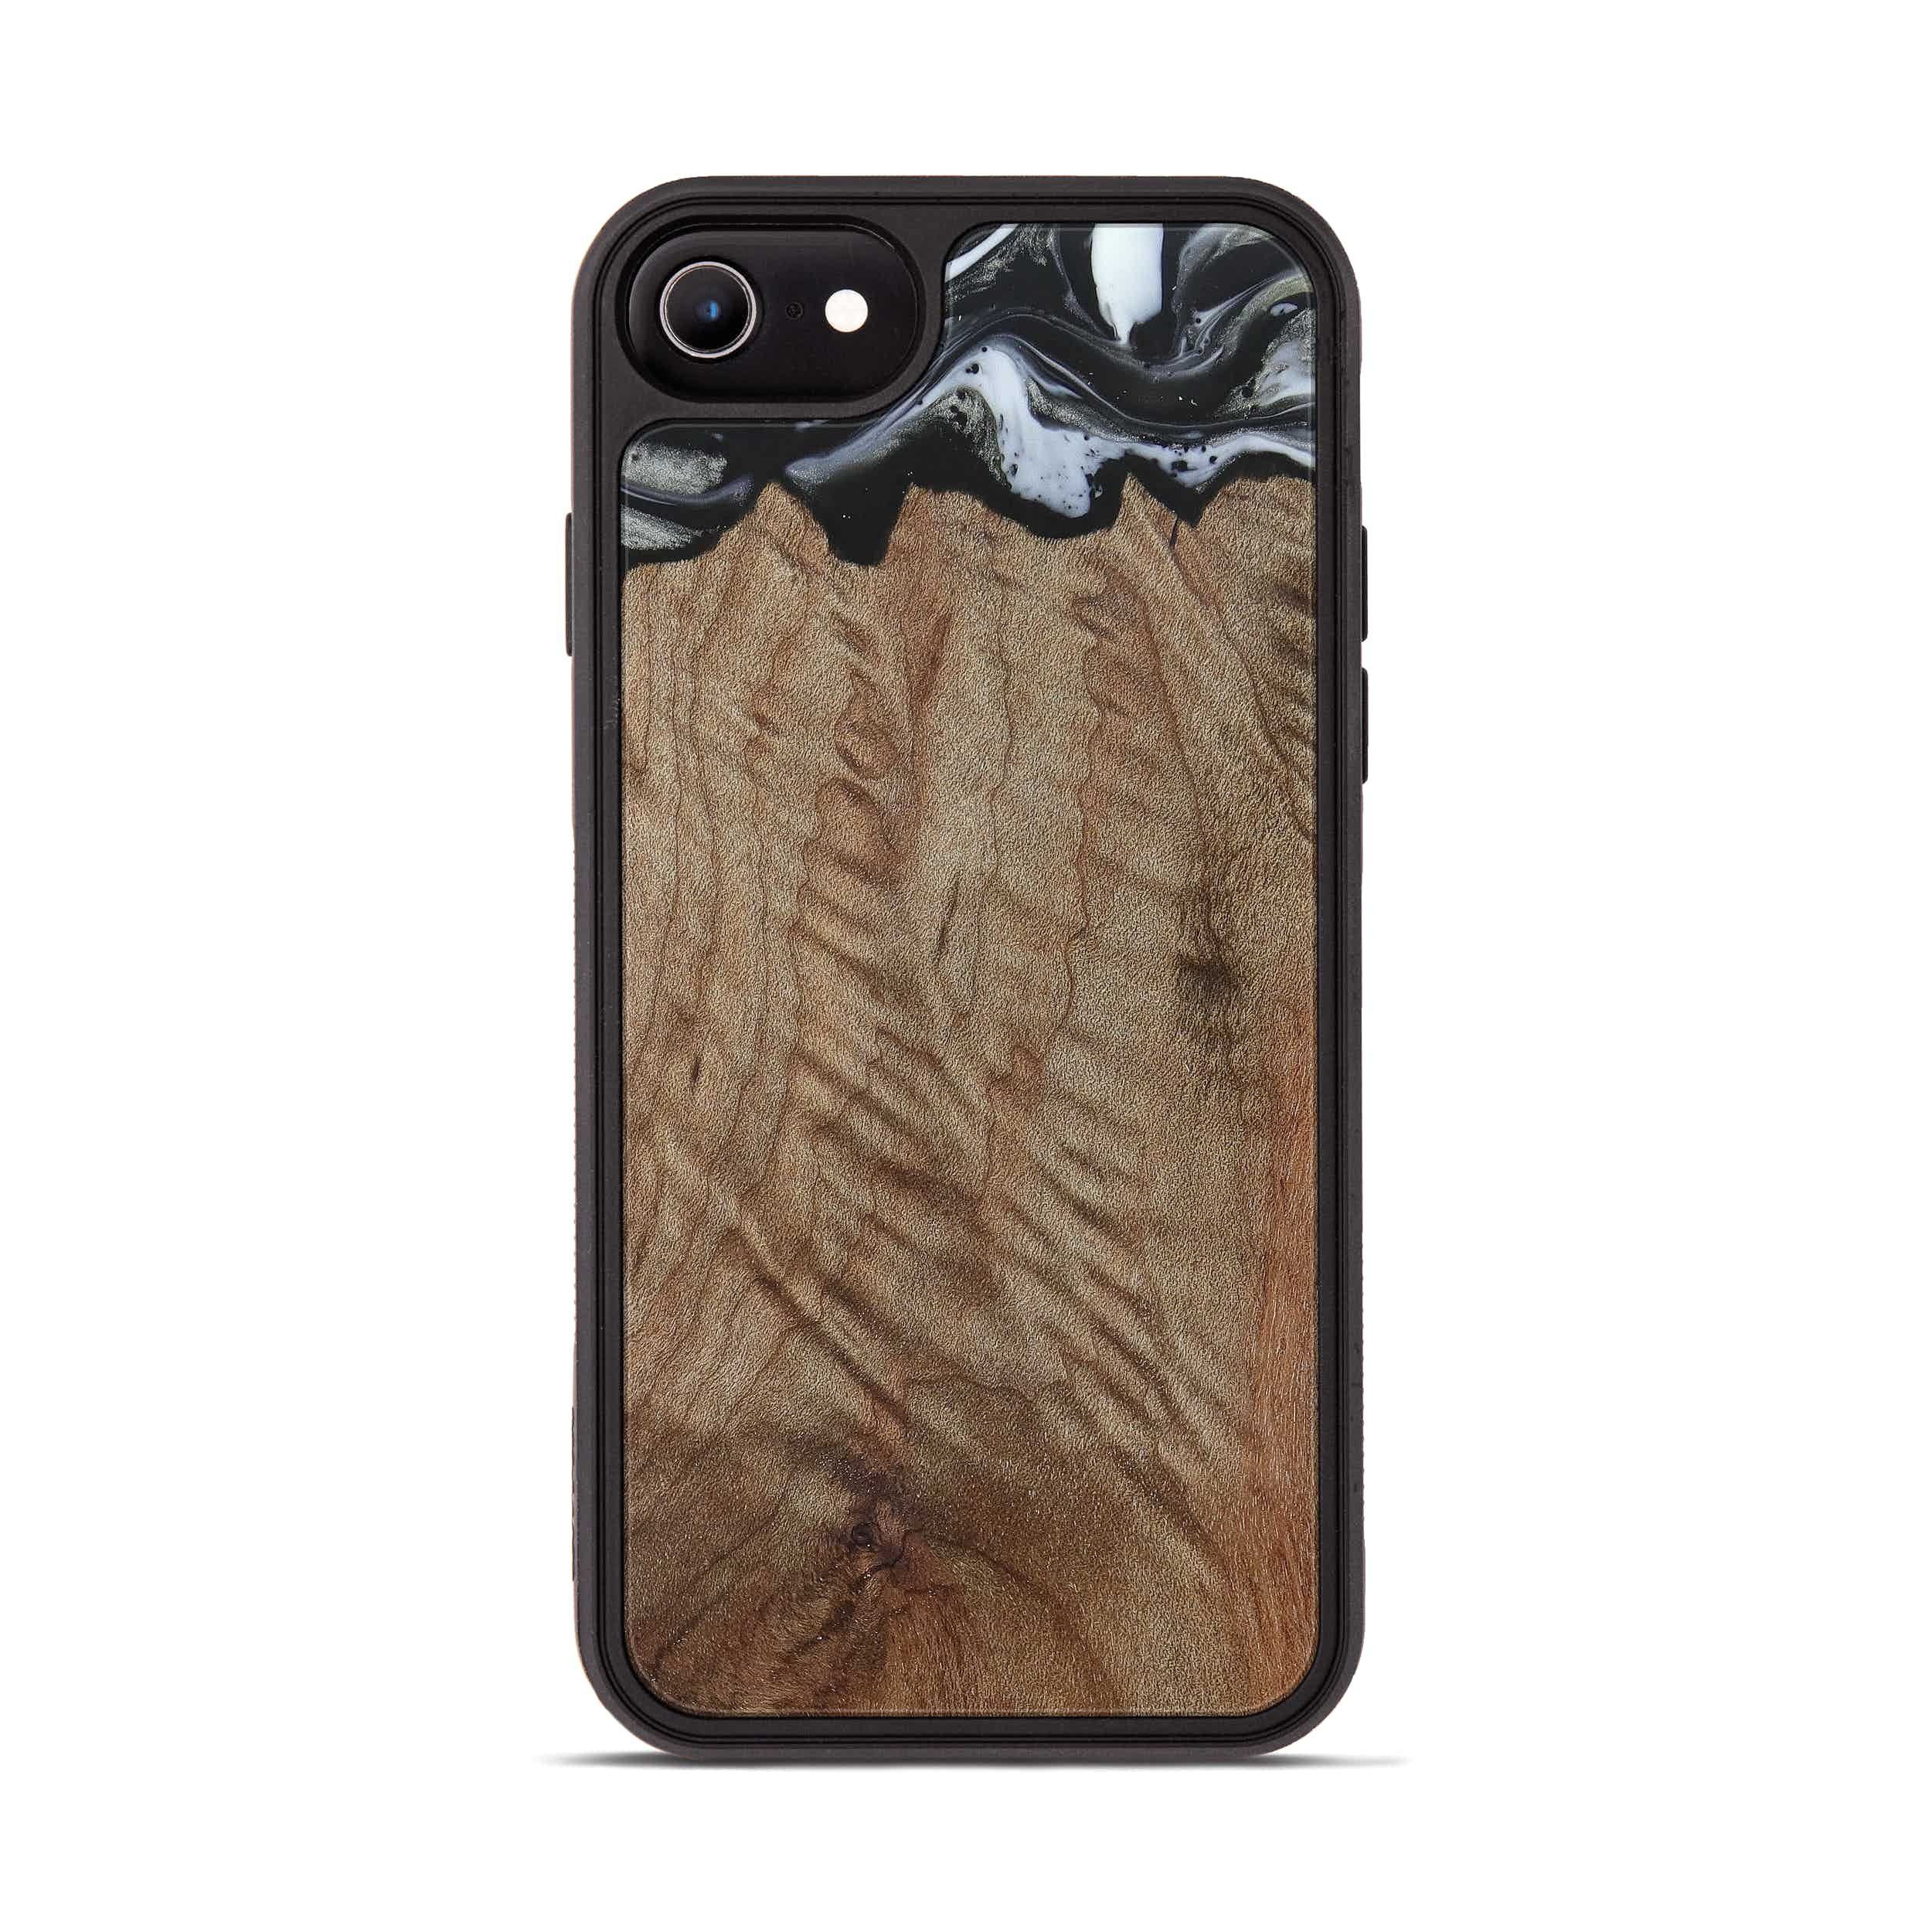 iPhone 8 Wood+Resin Phone Case - Kiem (Black & White, 385907)